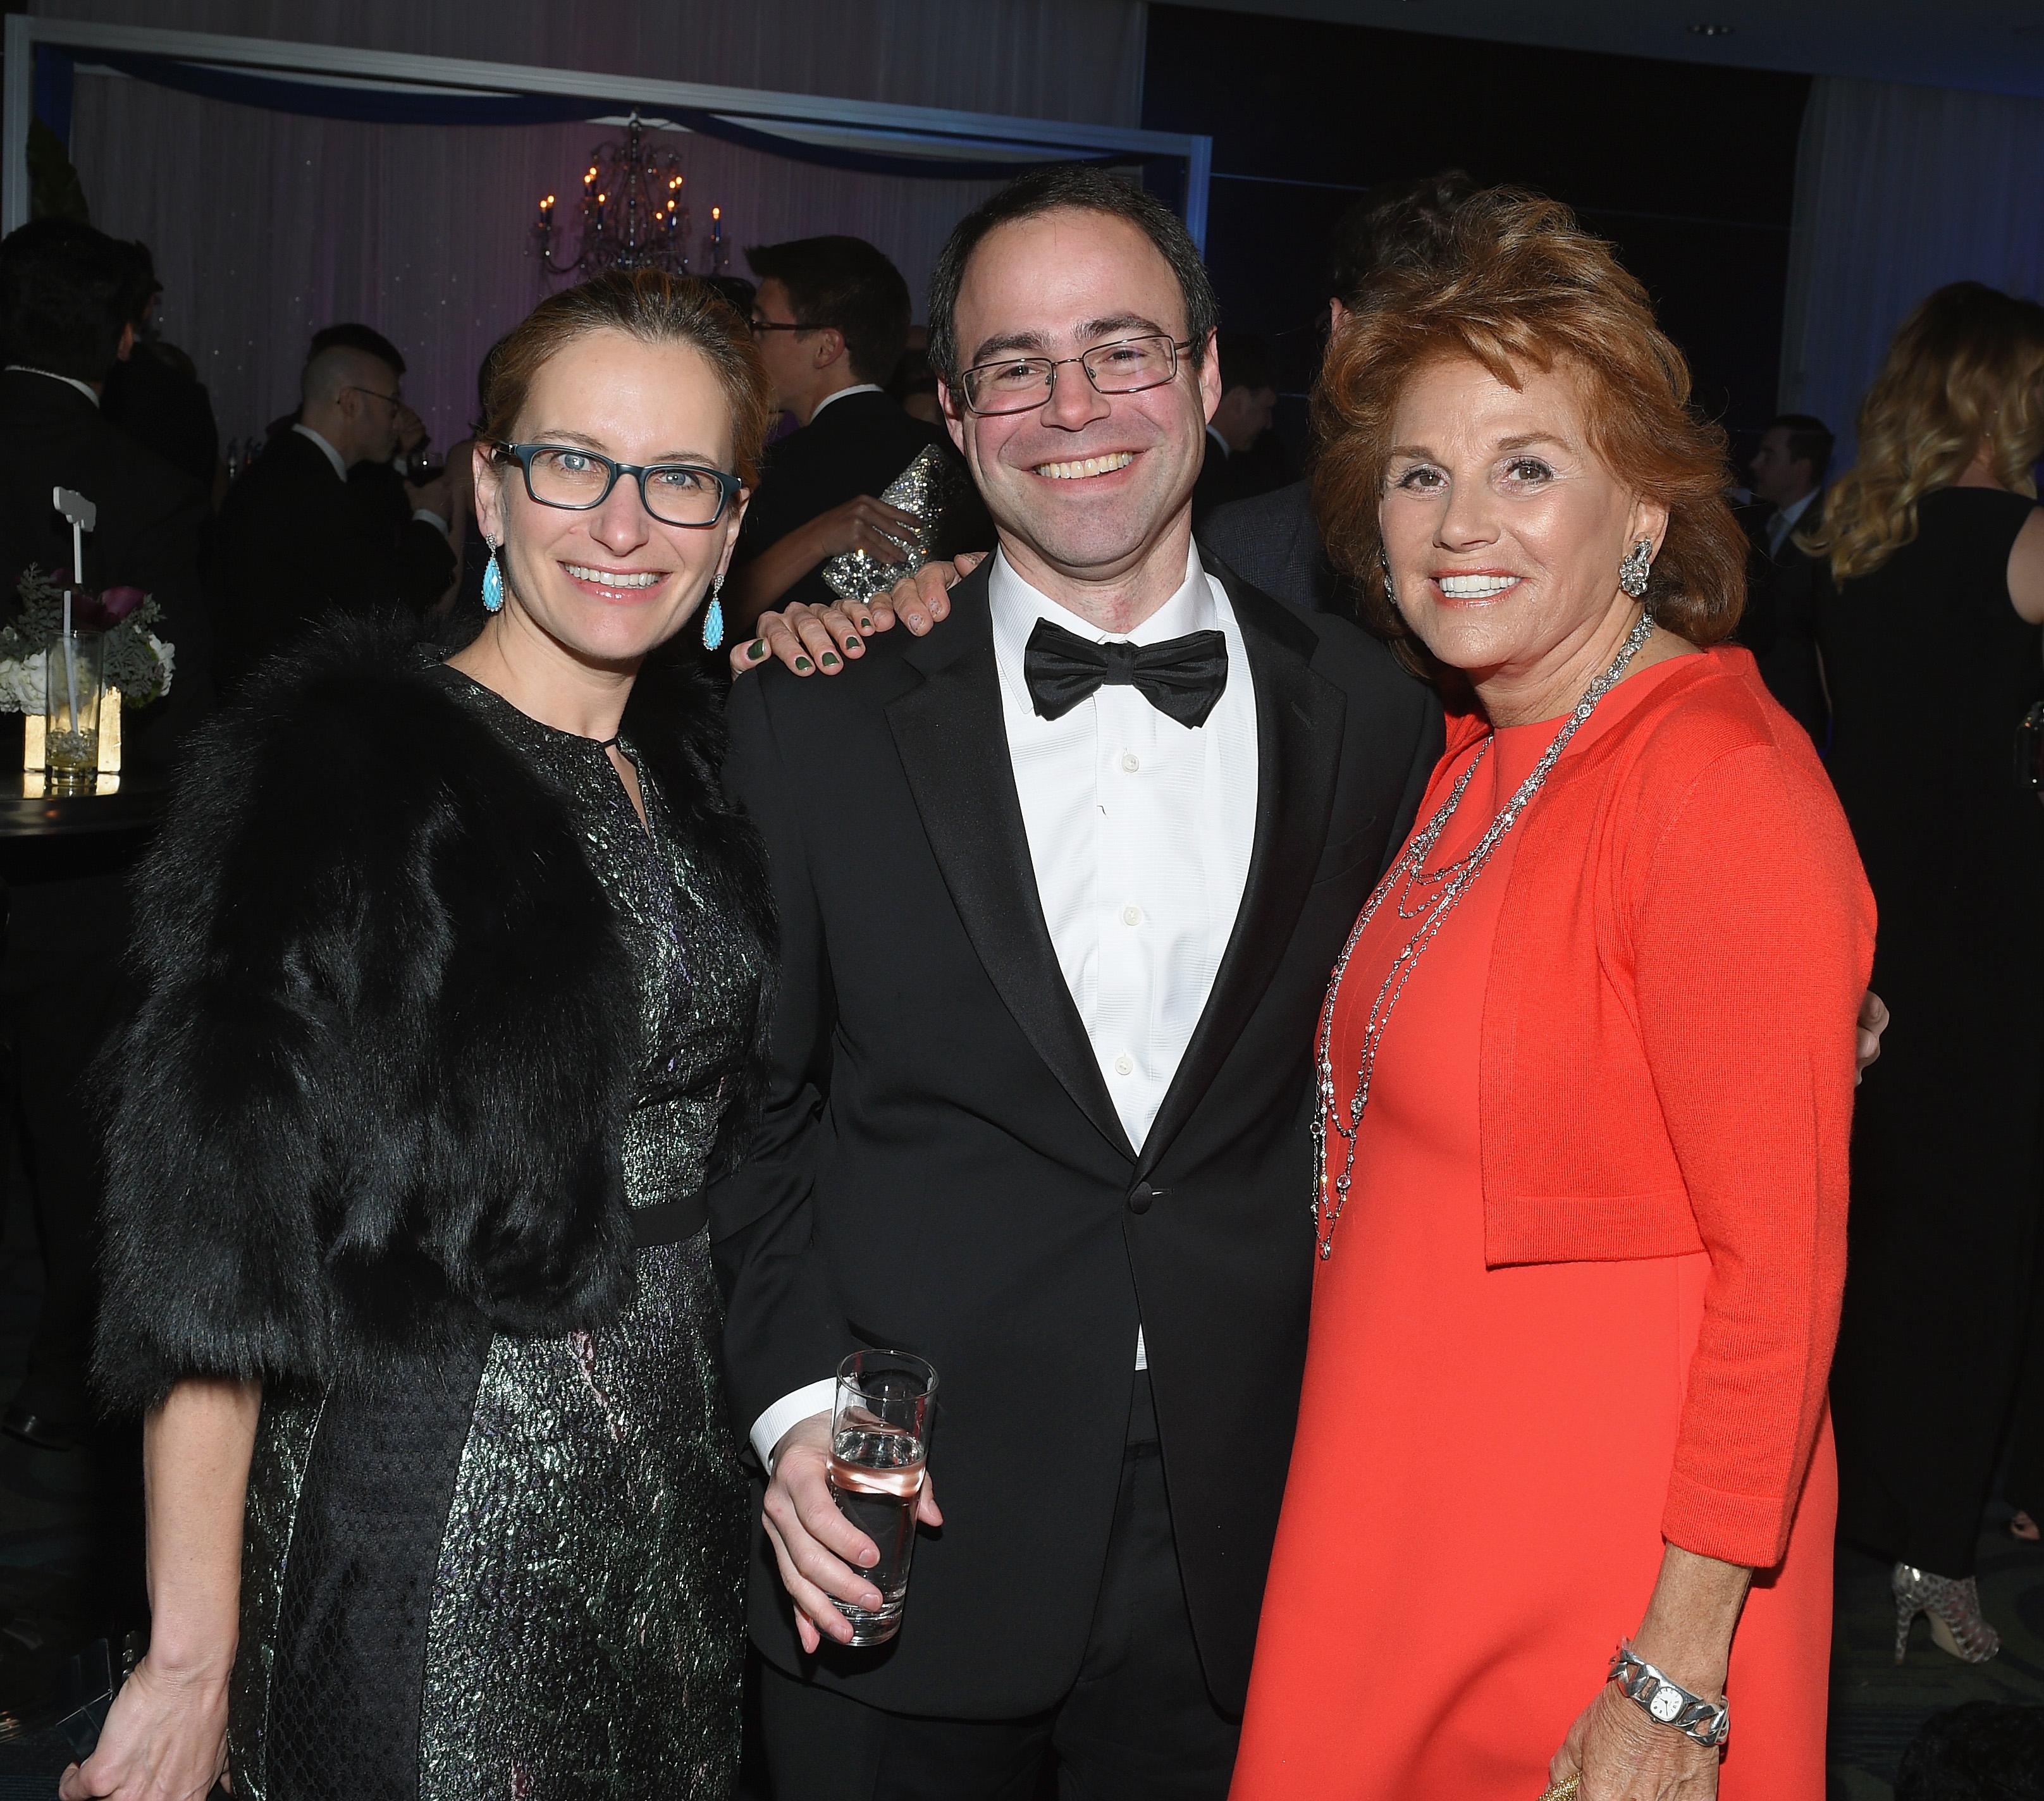 Yahoo News/ABC News White House Correspondents' Dinner Reception Pre-Party